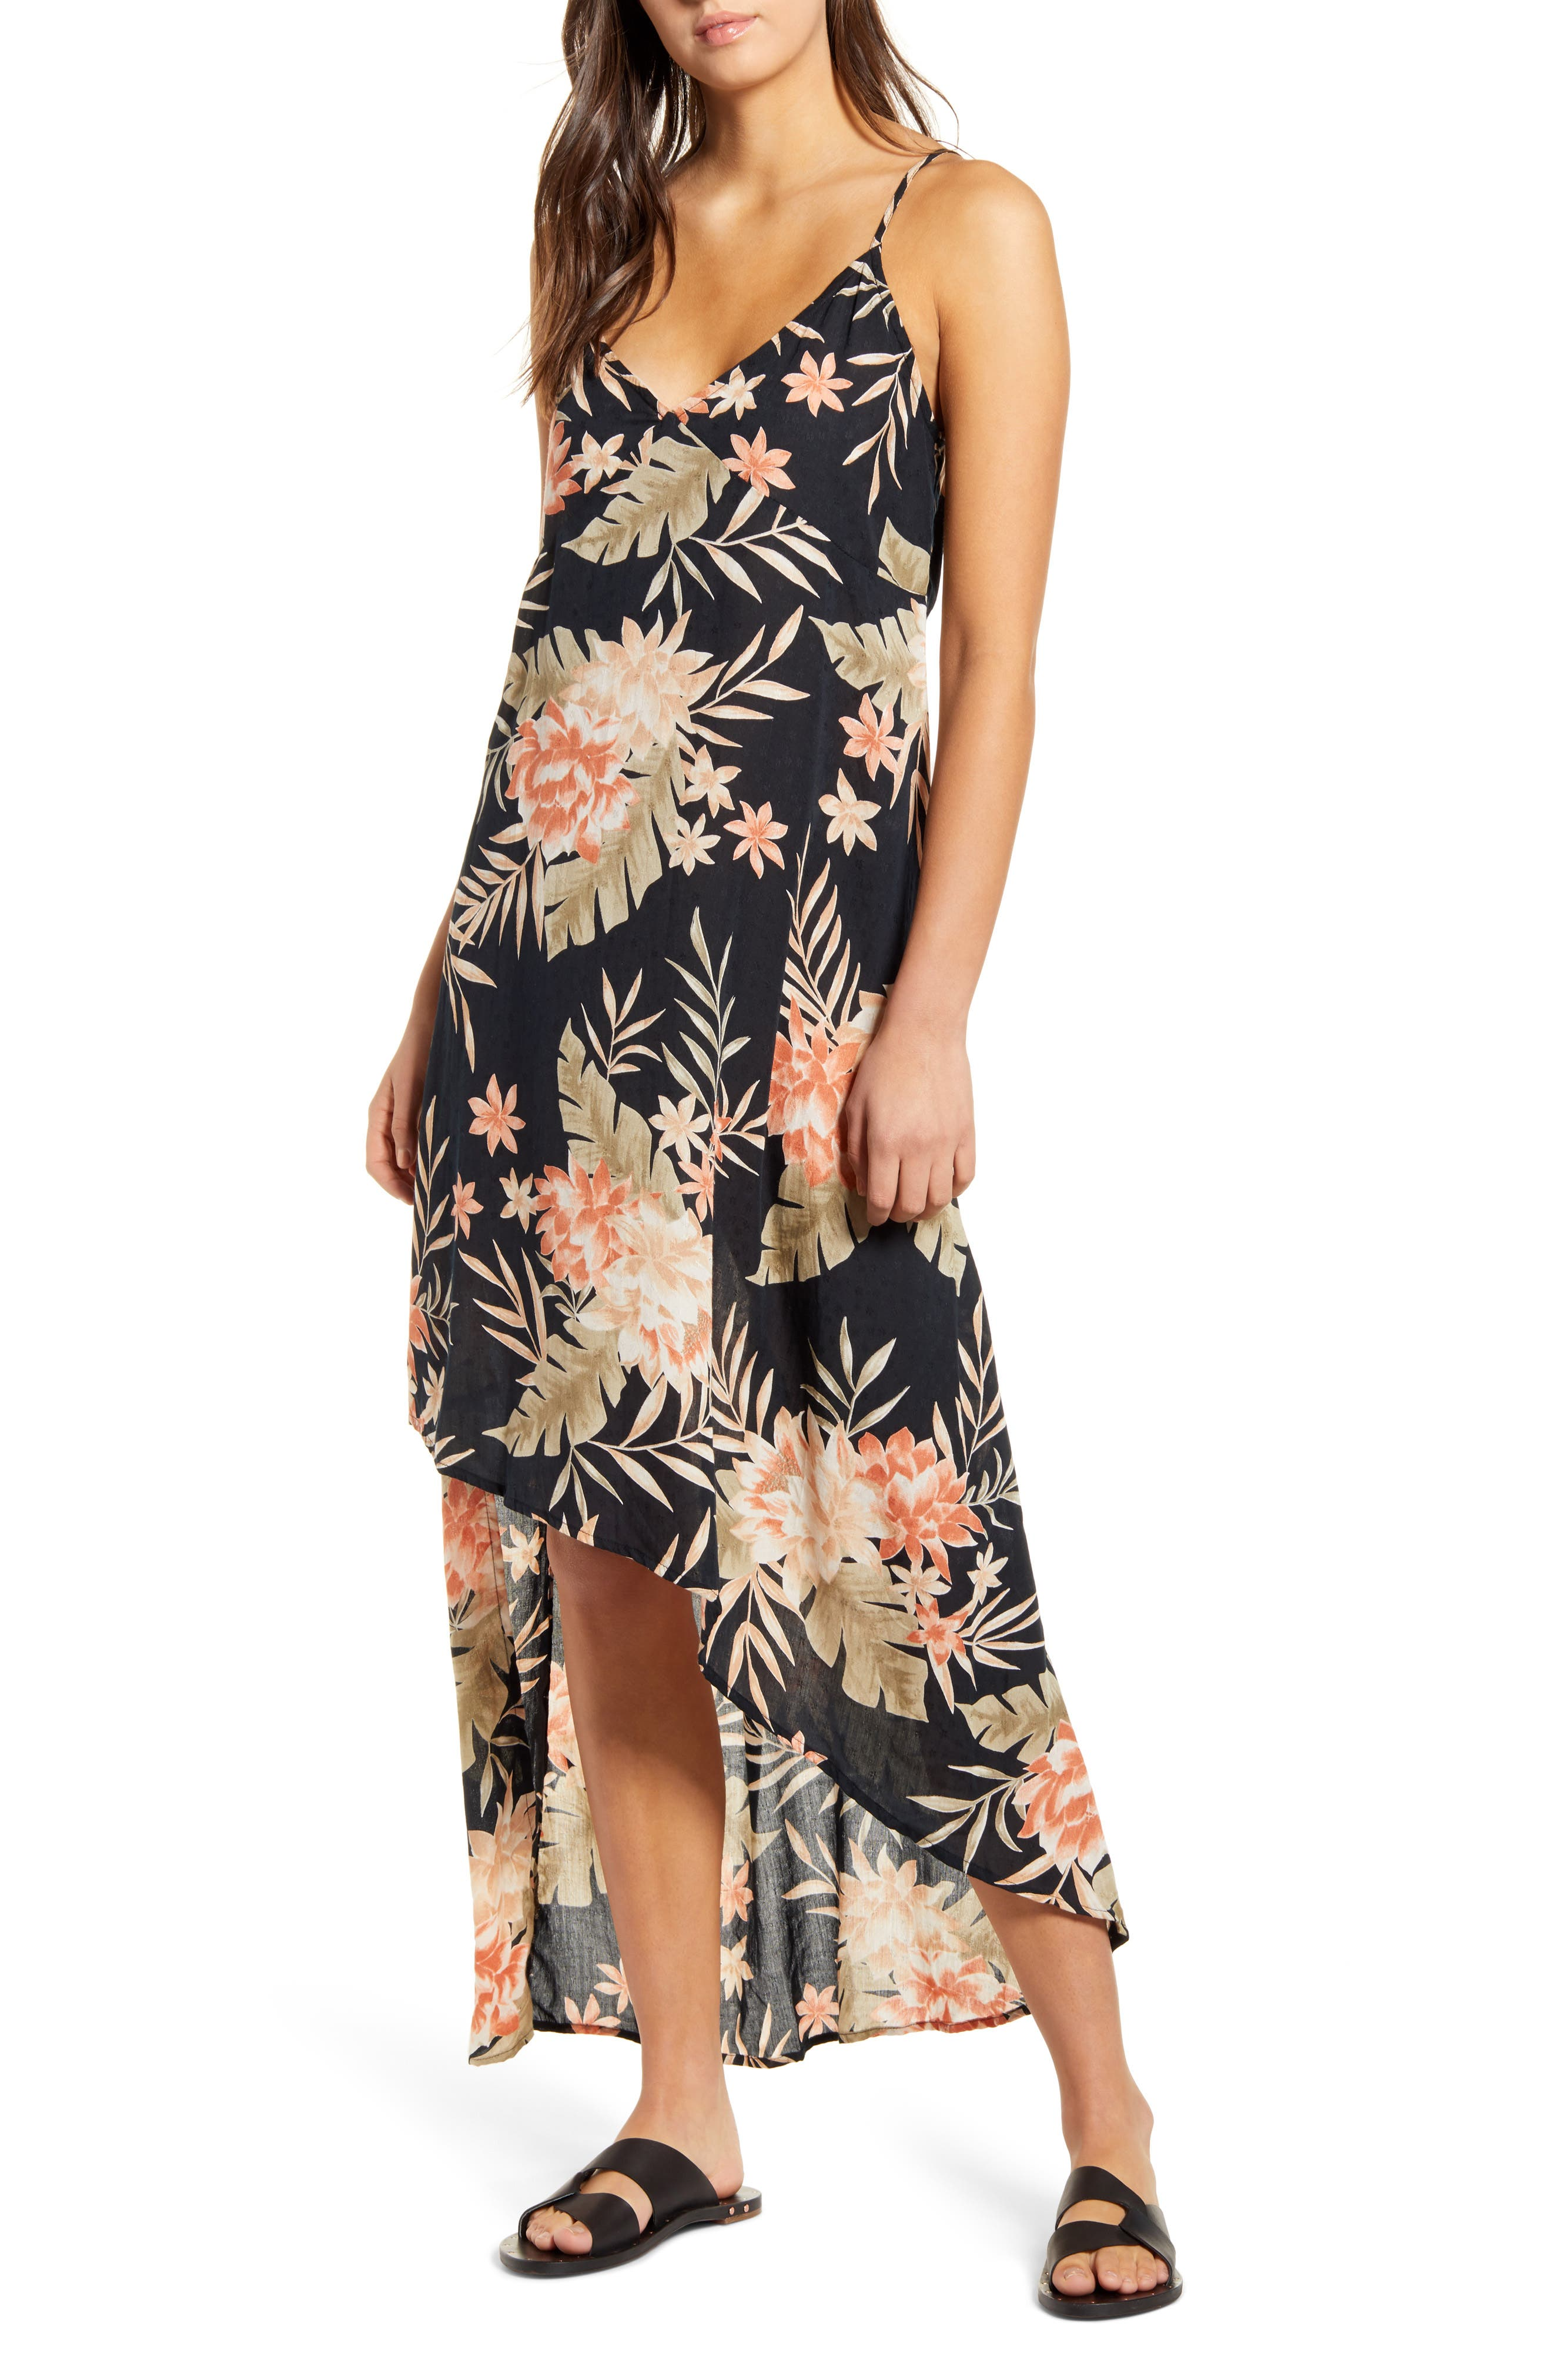 Image of Billabong Best Tropical Print High Low Maxi Dress